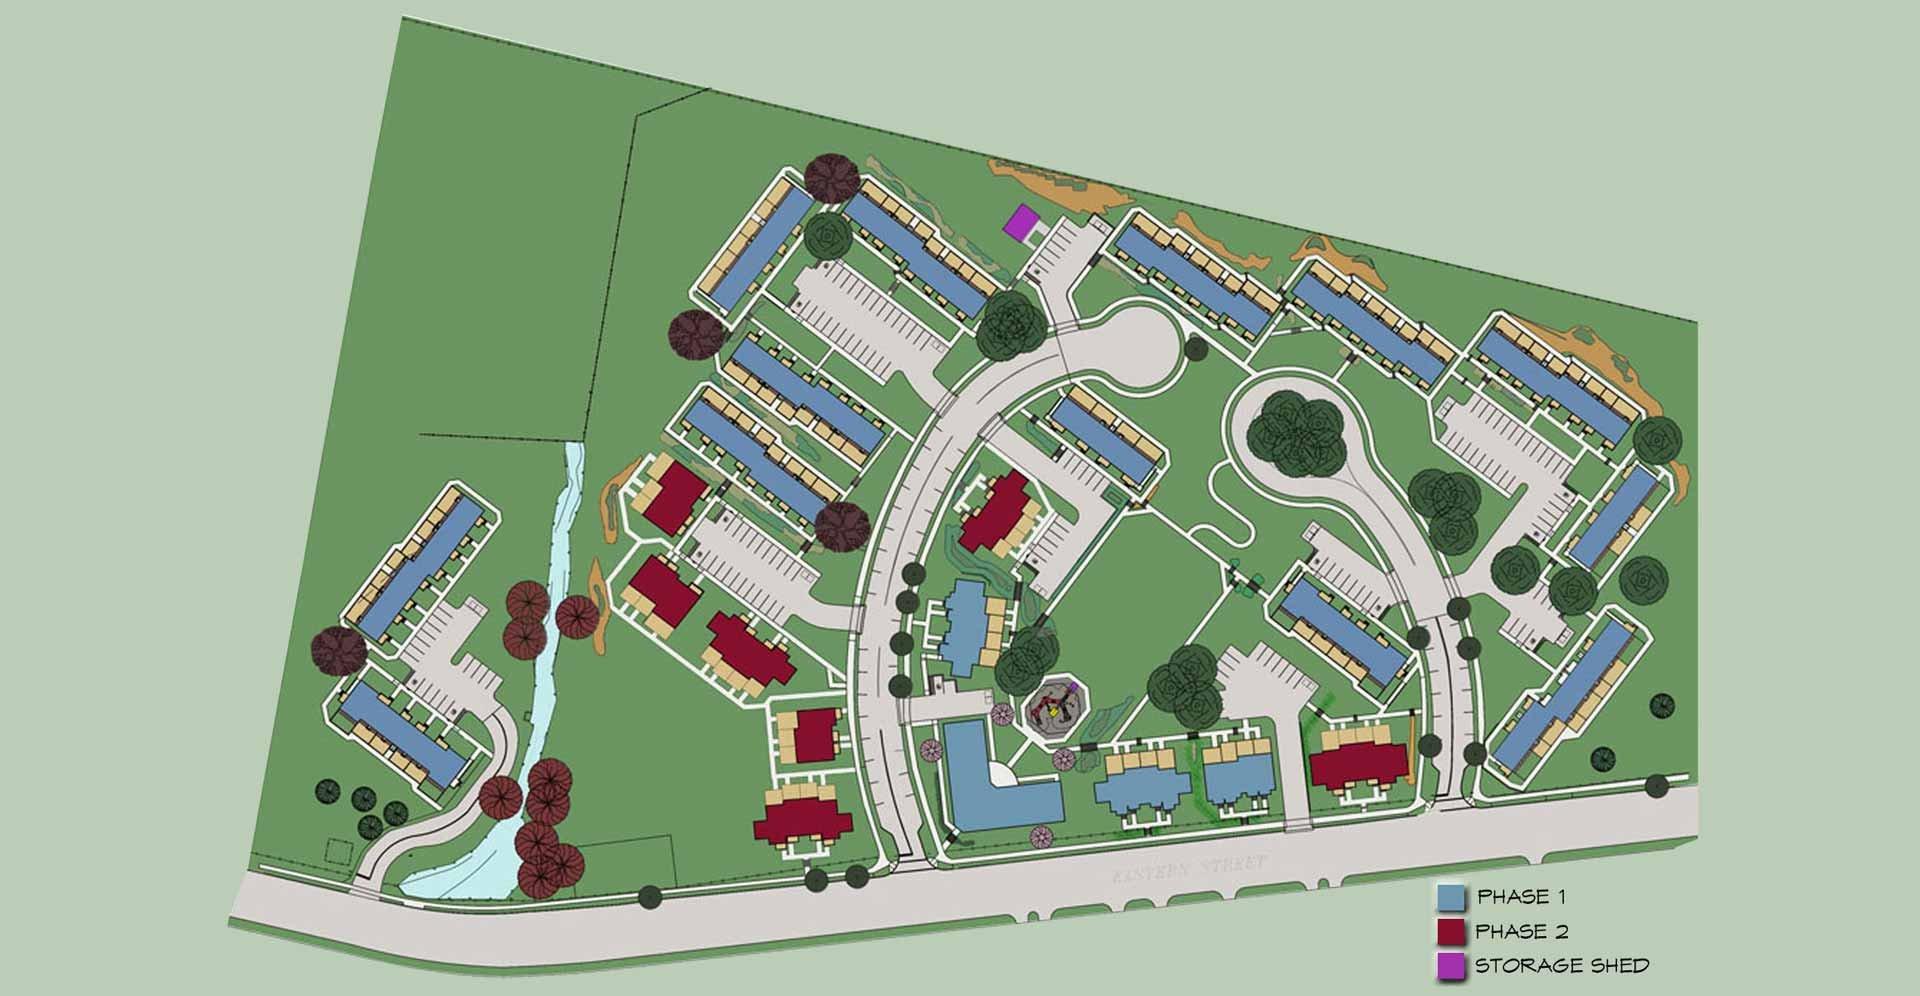 EASTVIEW-TERRACE-HOUSING-SITE-PLAN-12-15.jpg